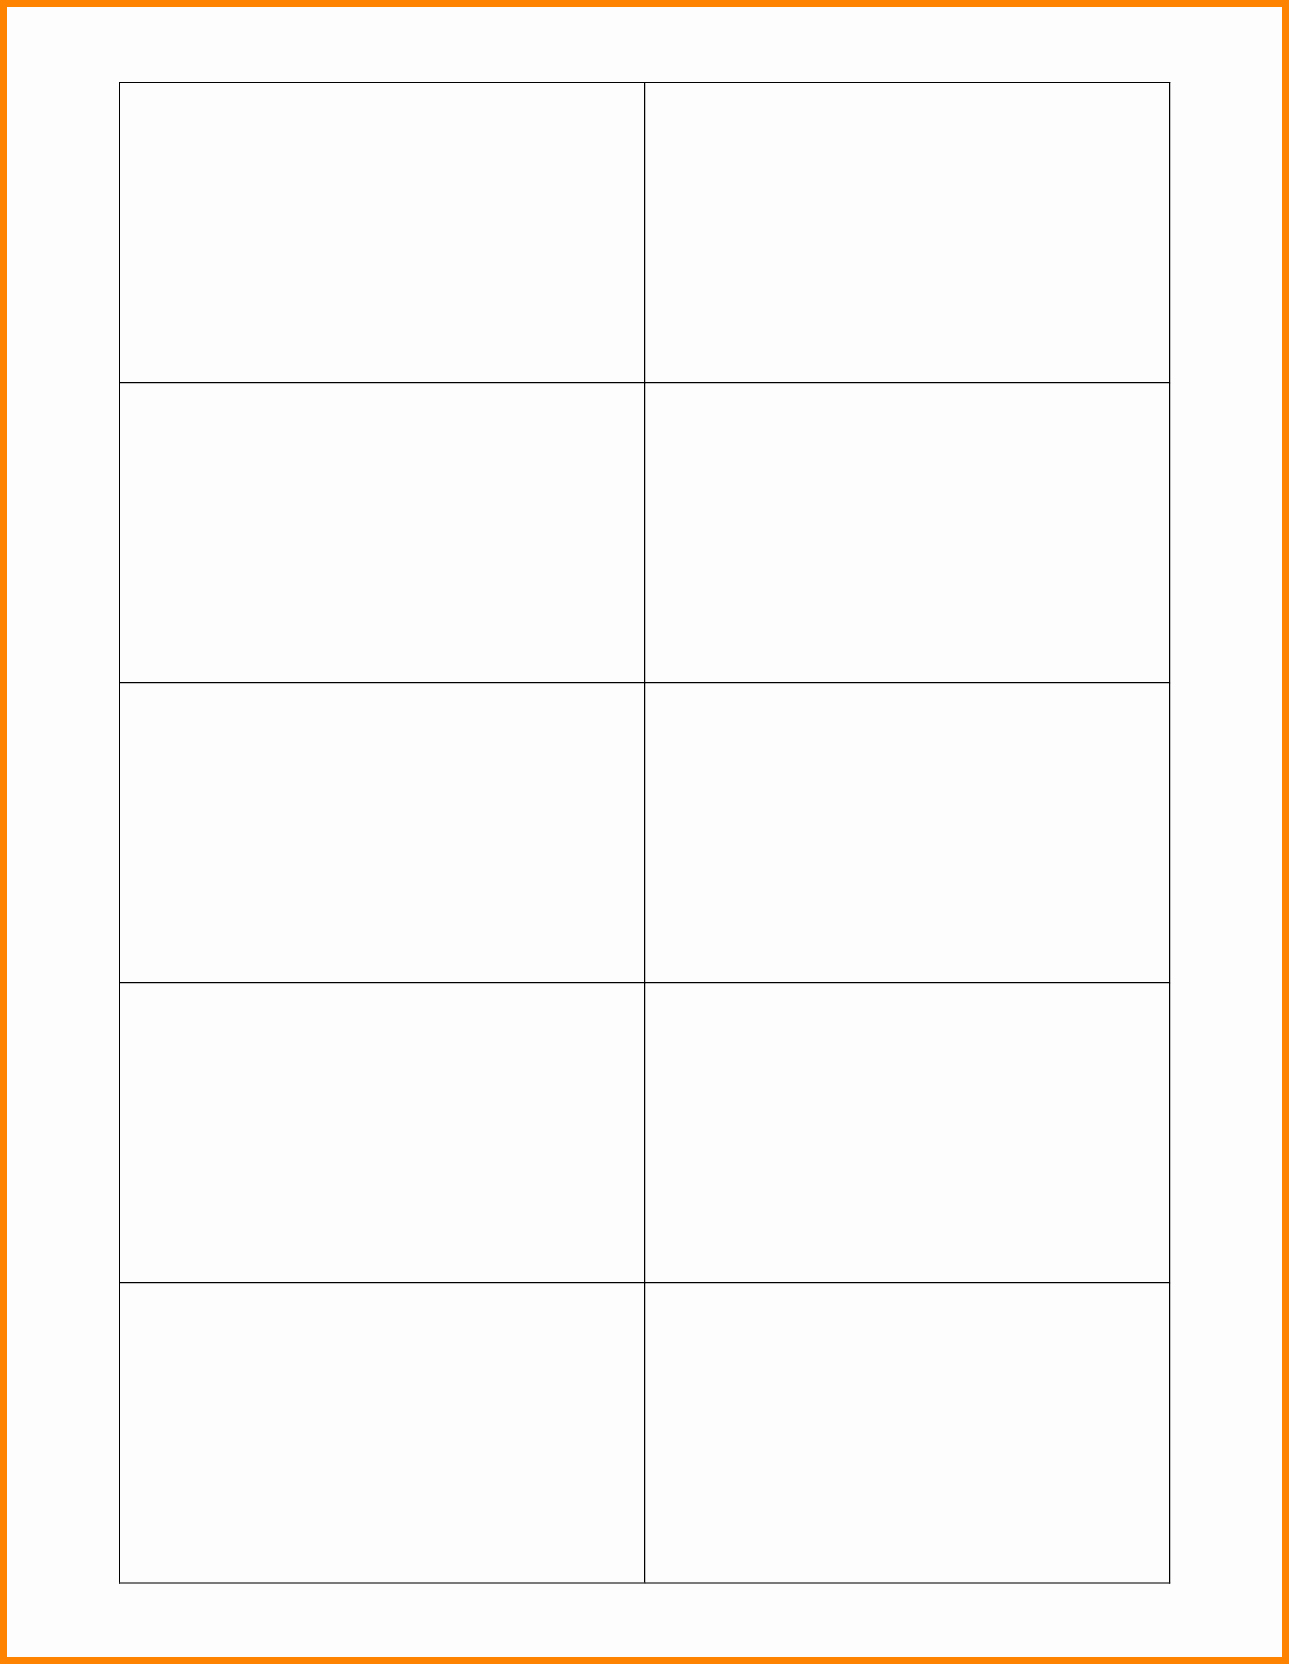 Microsoft Business Card Templates Free Elegant Blank Business Card Template Word Blank Business Card